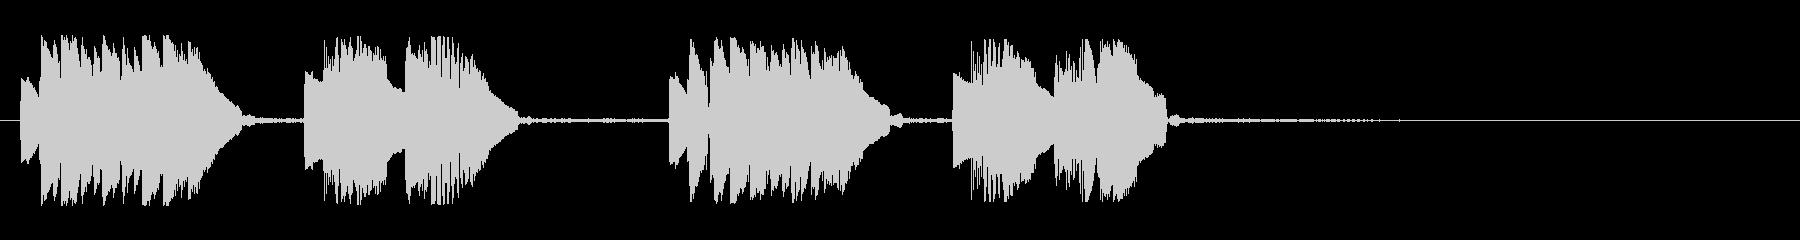 KANT近未来アラーム010234の未再生の波形